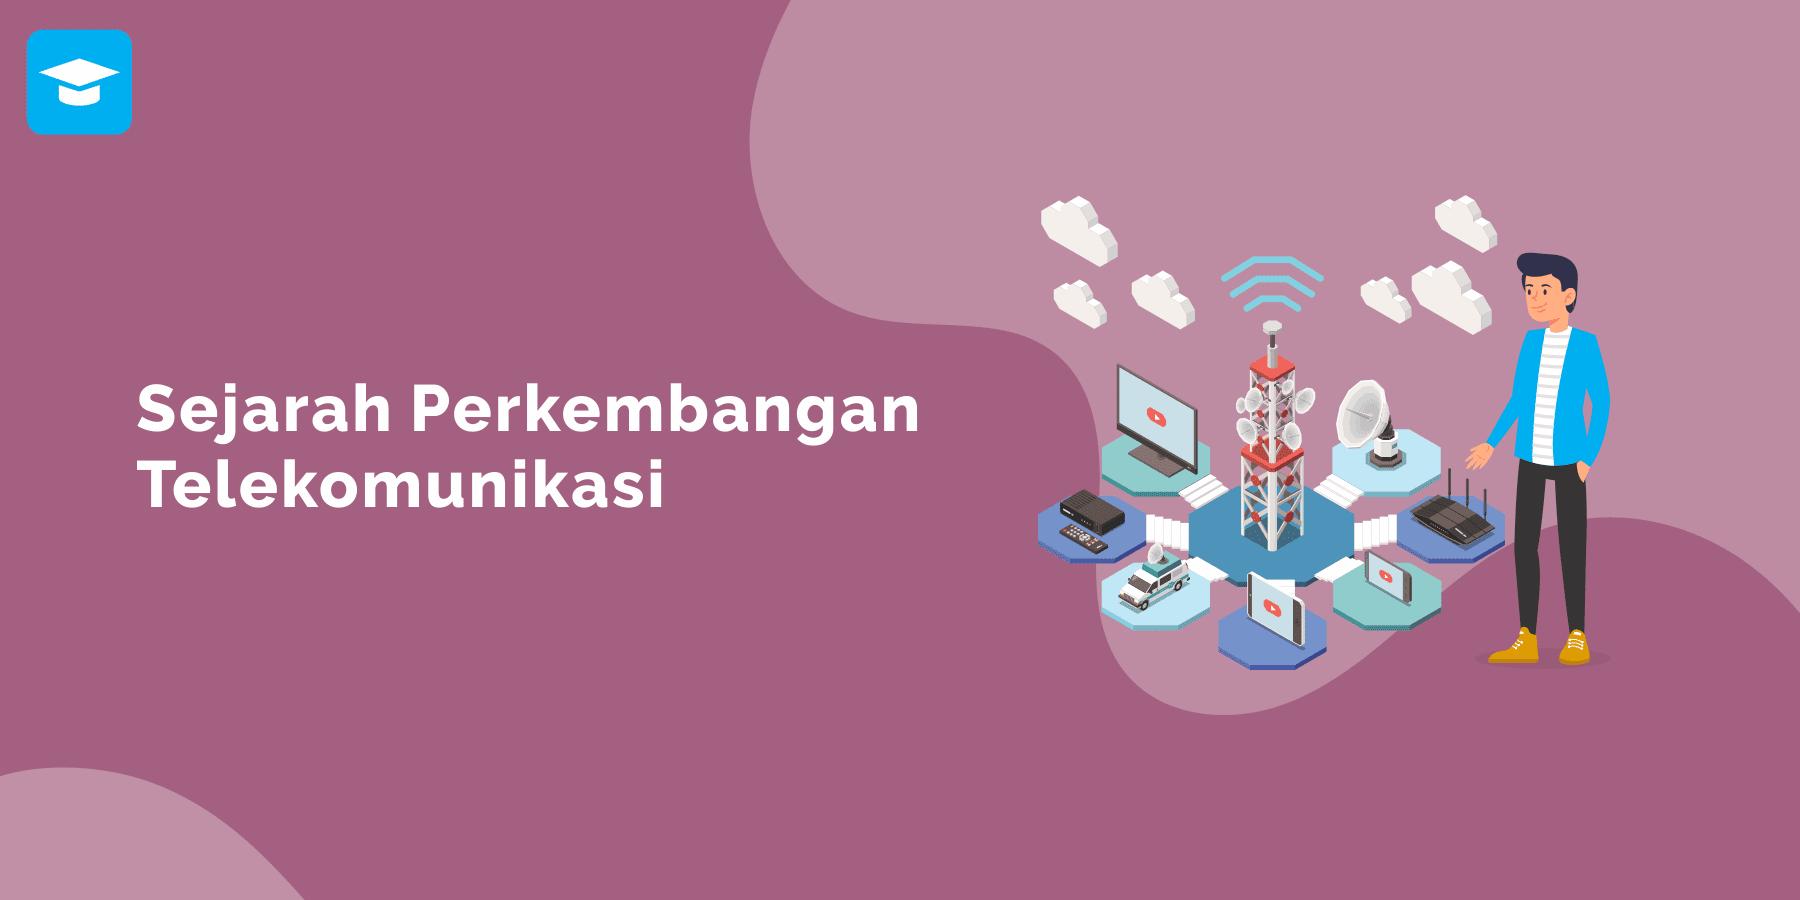 Perkembangan telekomunikasi